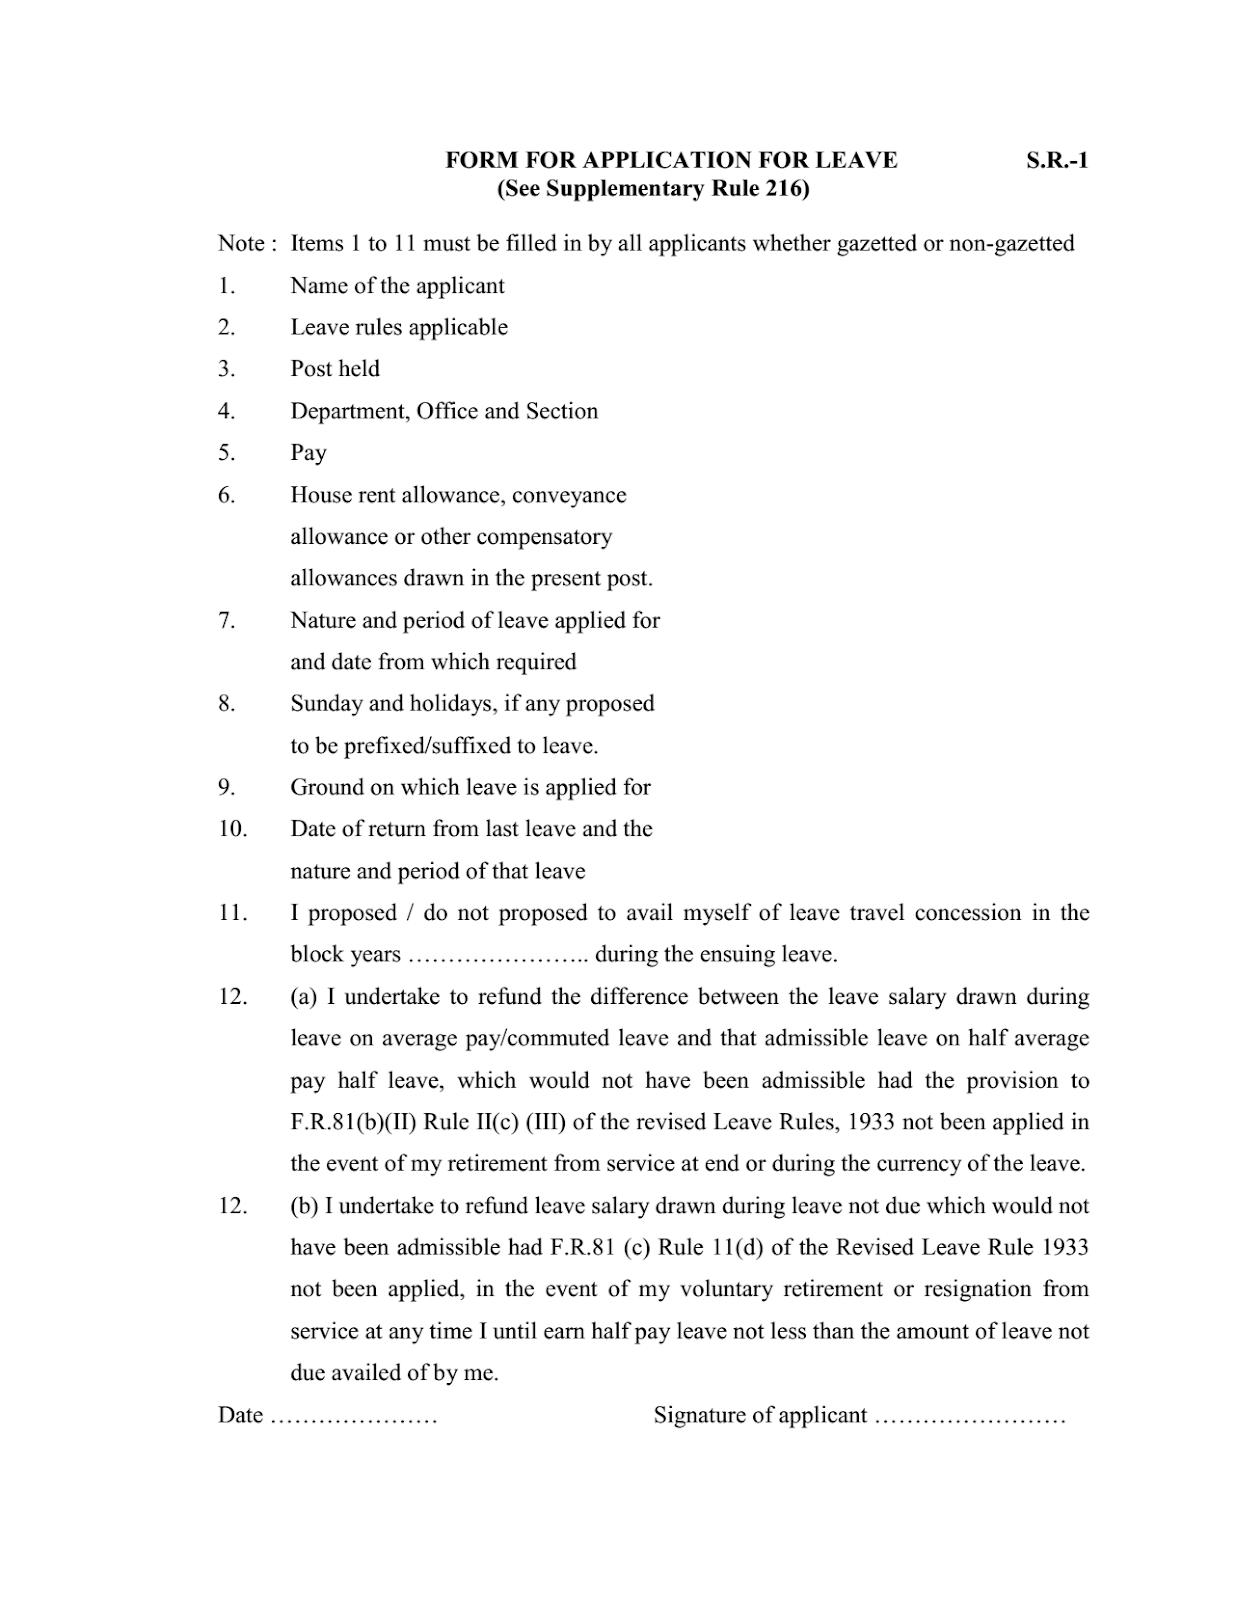 SR - 1 Form for applying leave - PoTools